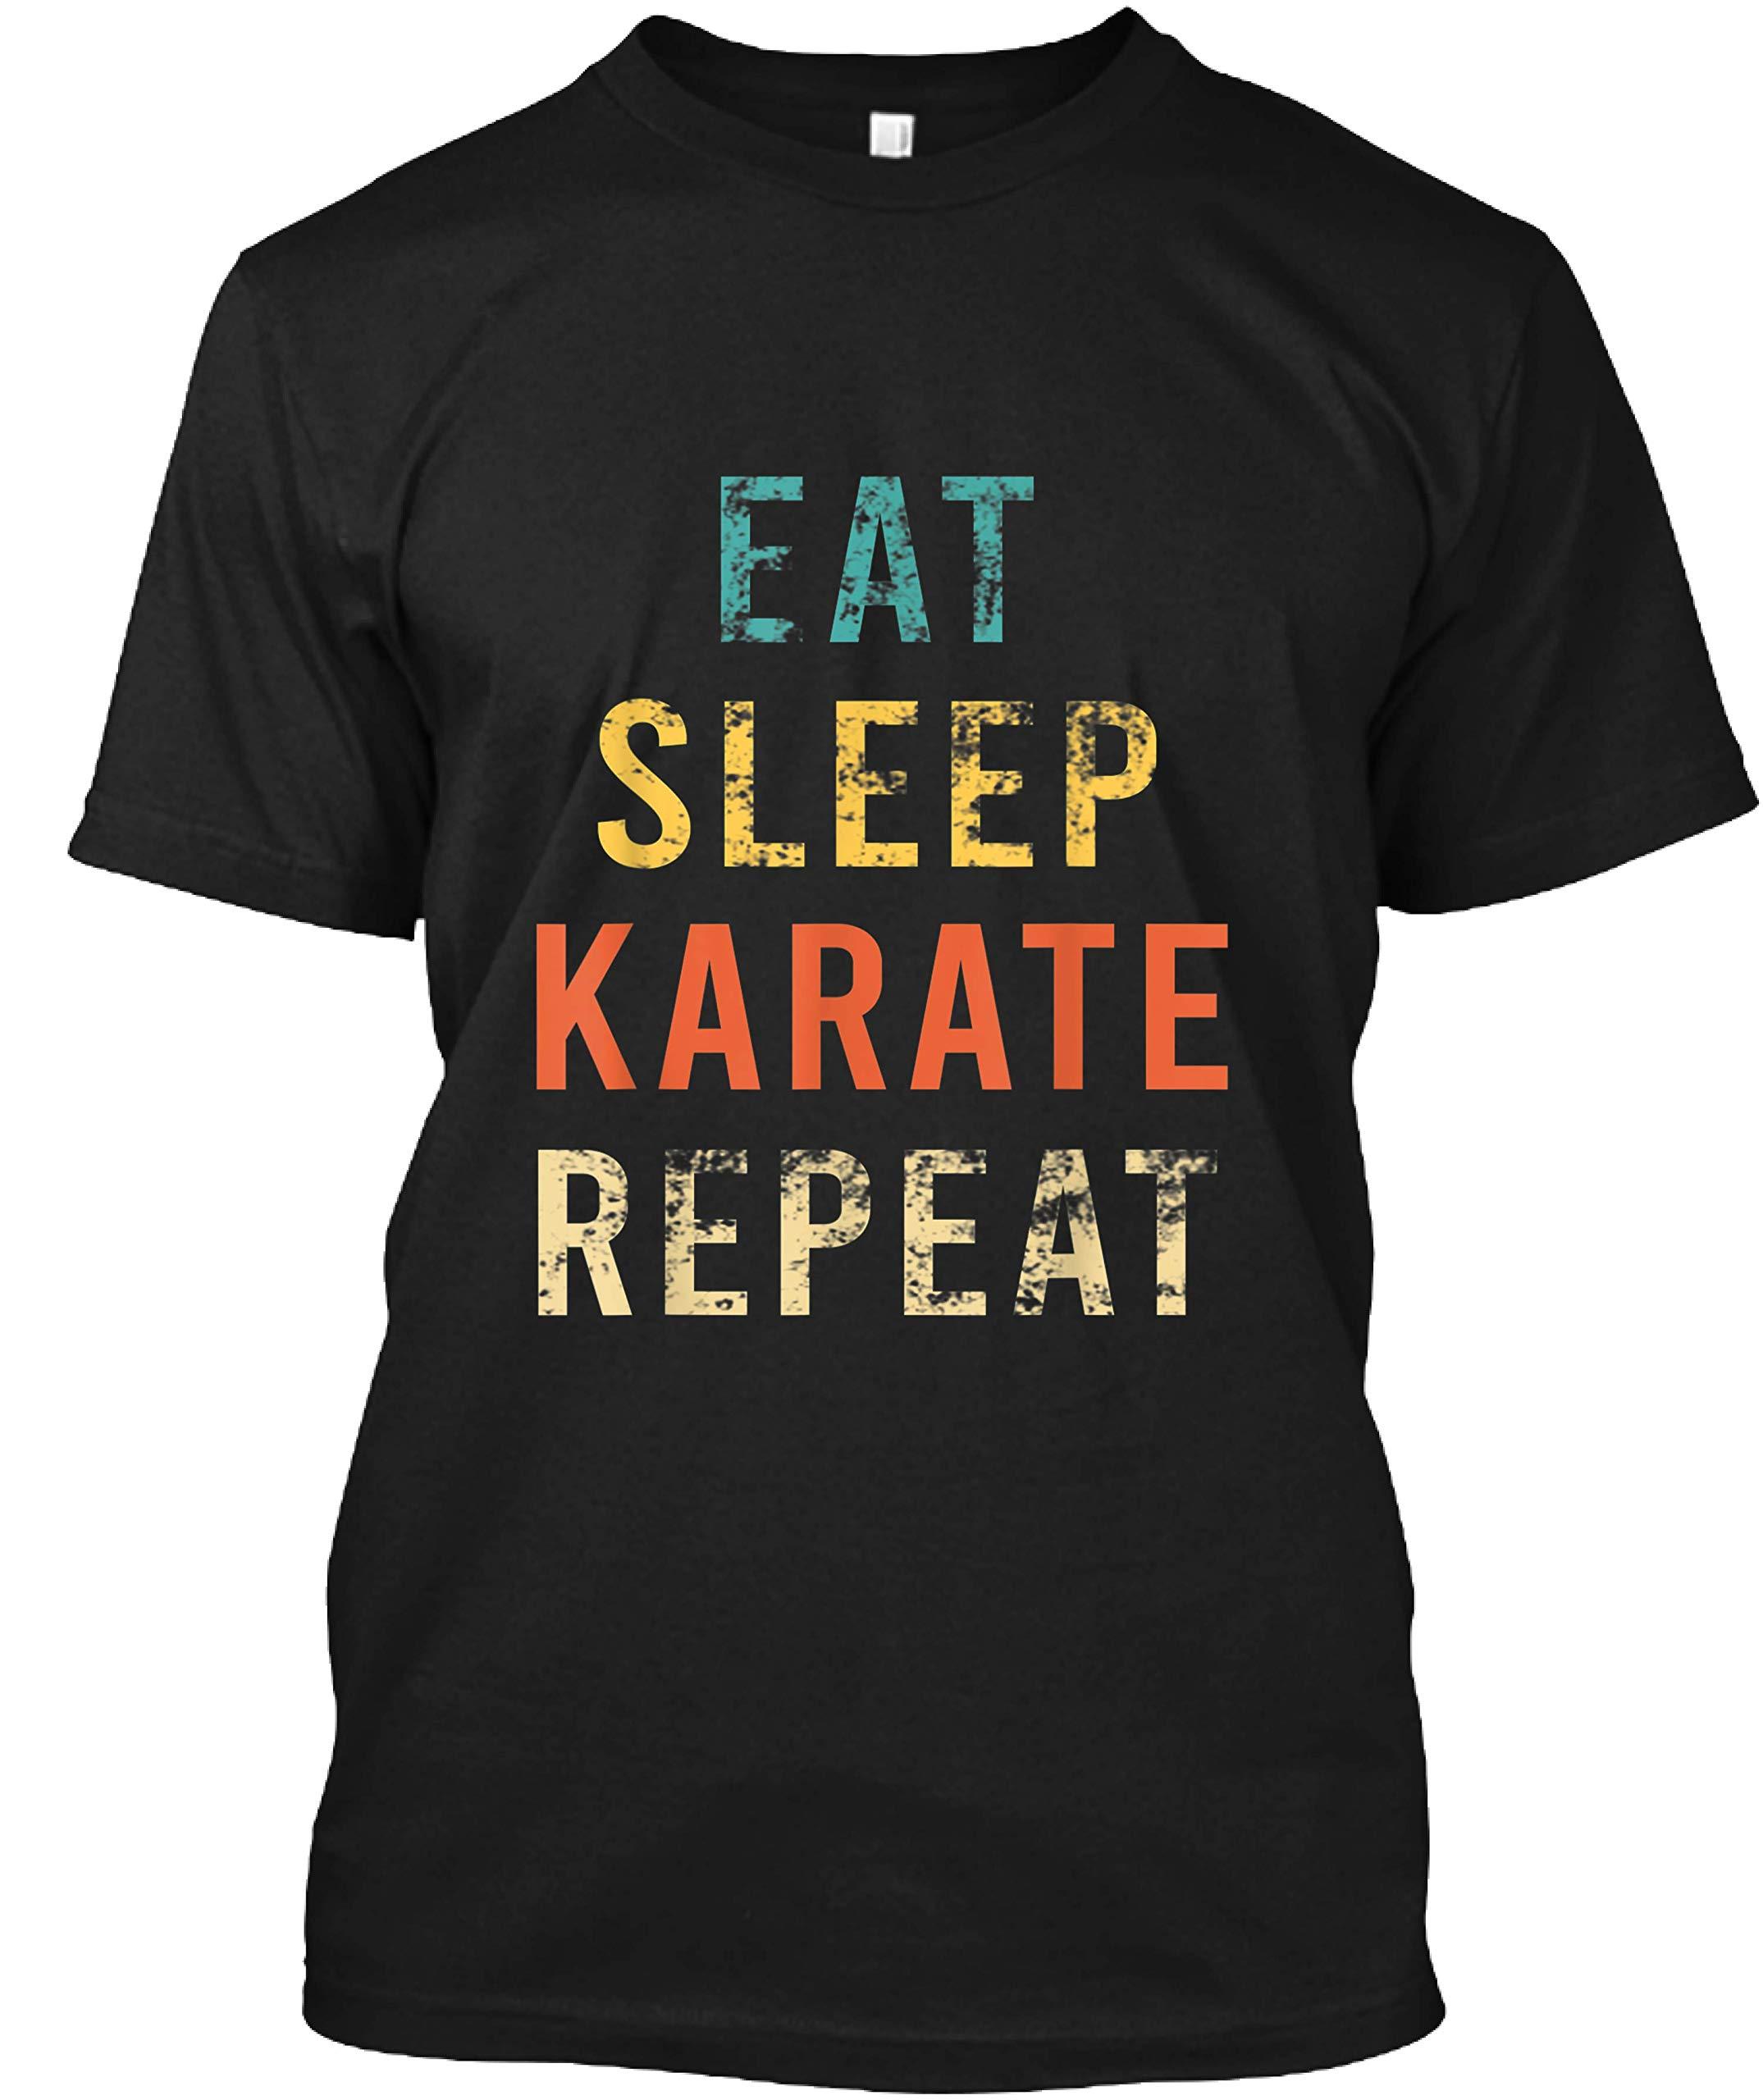 Retro Eat Sleep Karate Repea Karate Fan Coach Trainer Shirts